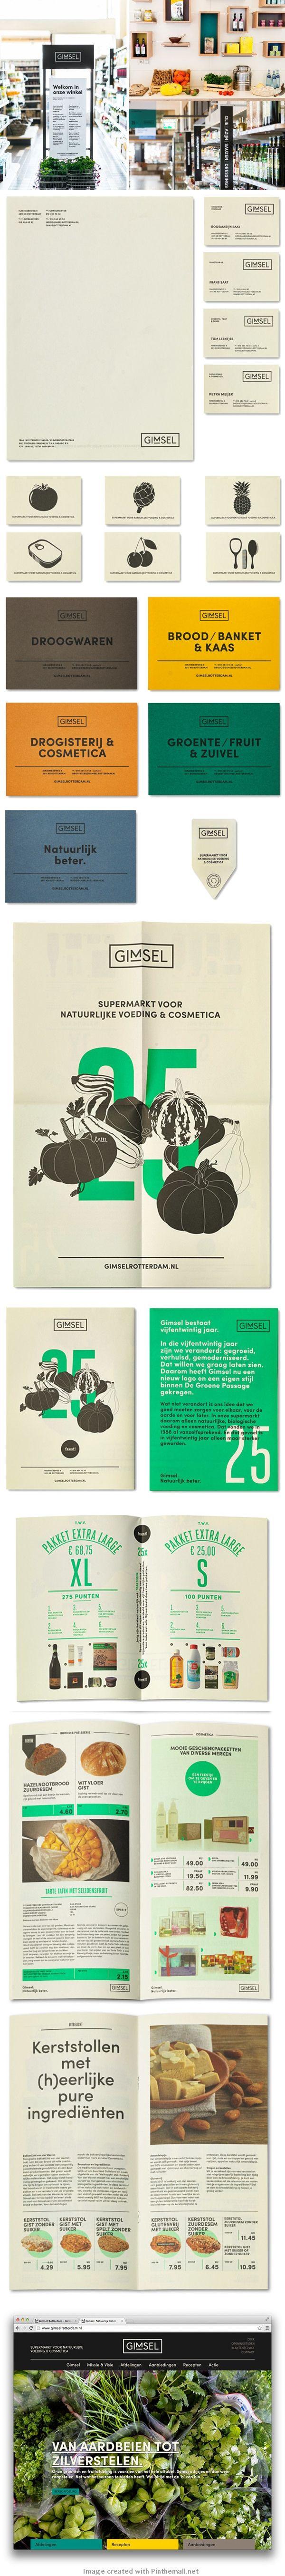 Gimsel Organic Supermarket / by Studio Beige